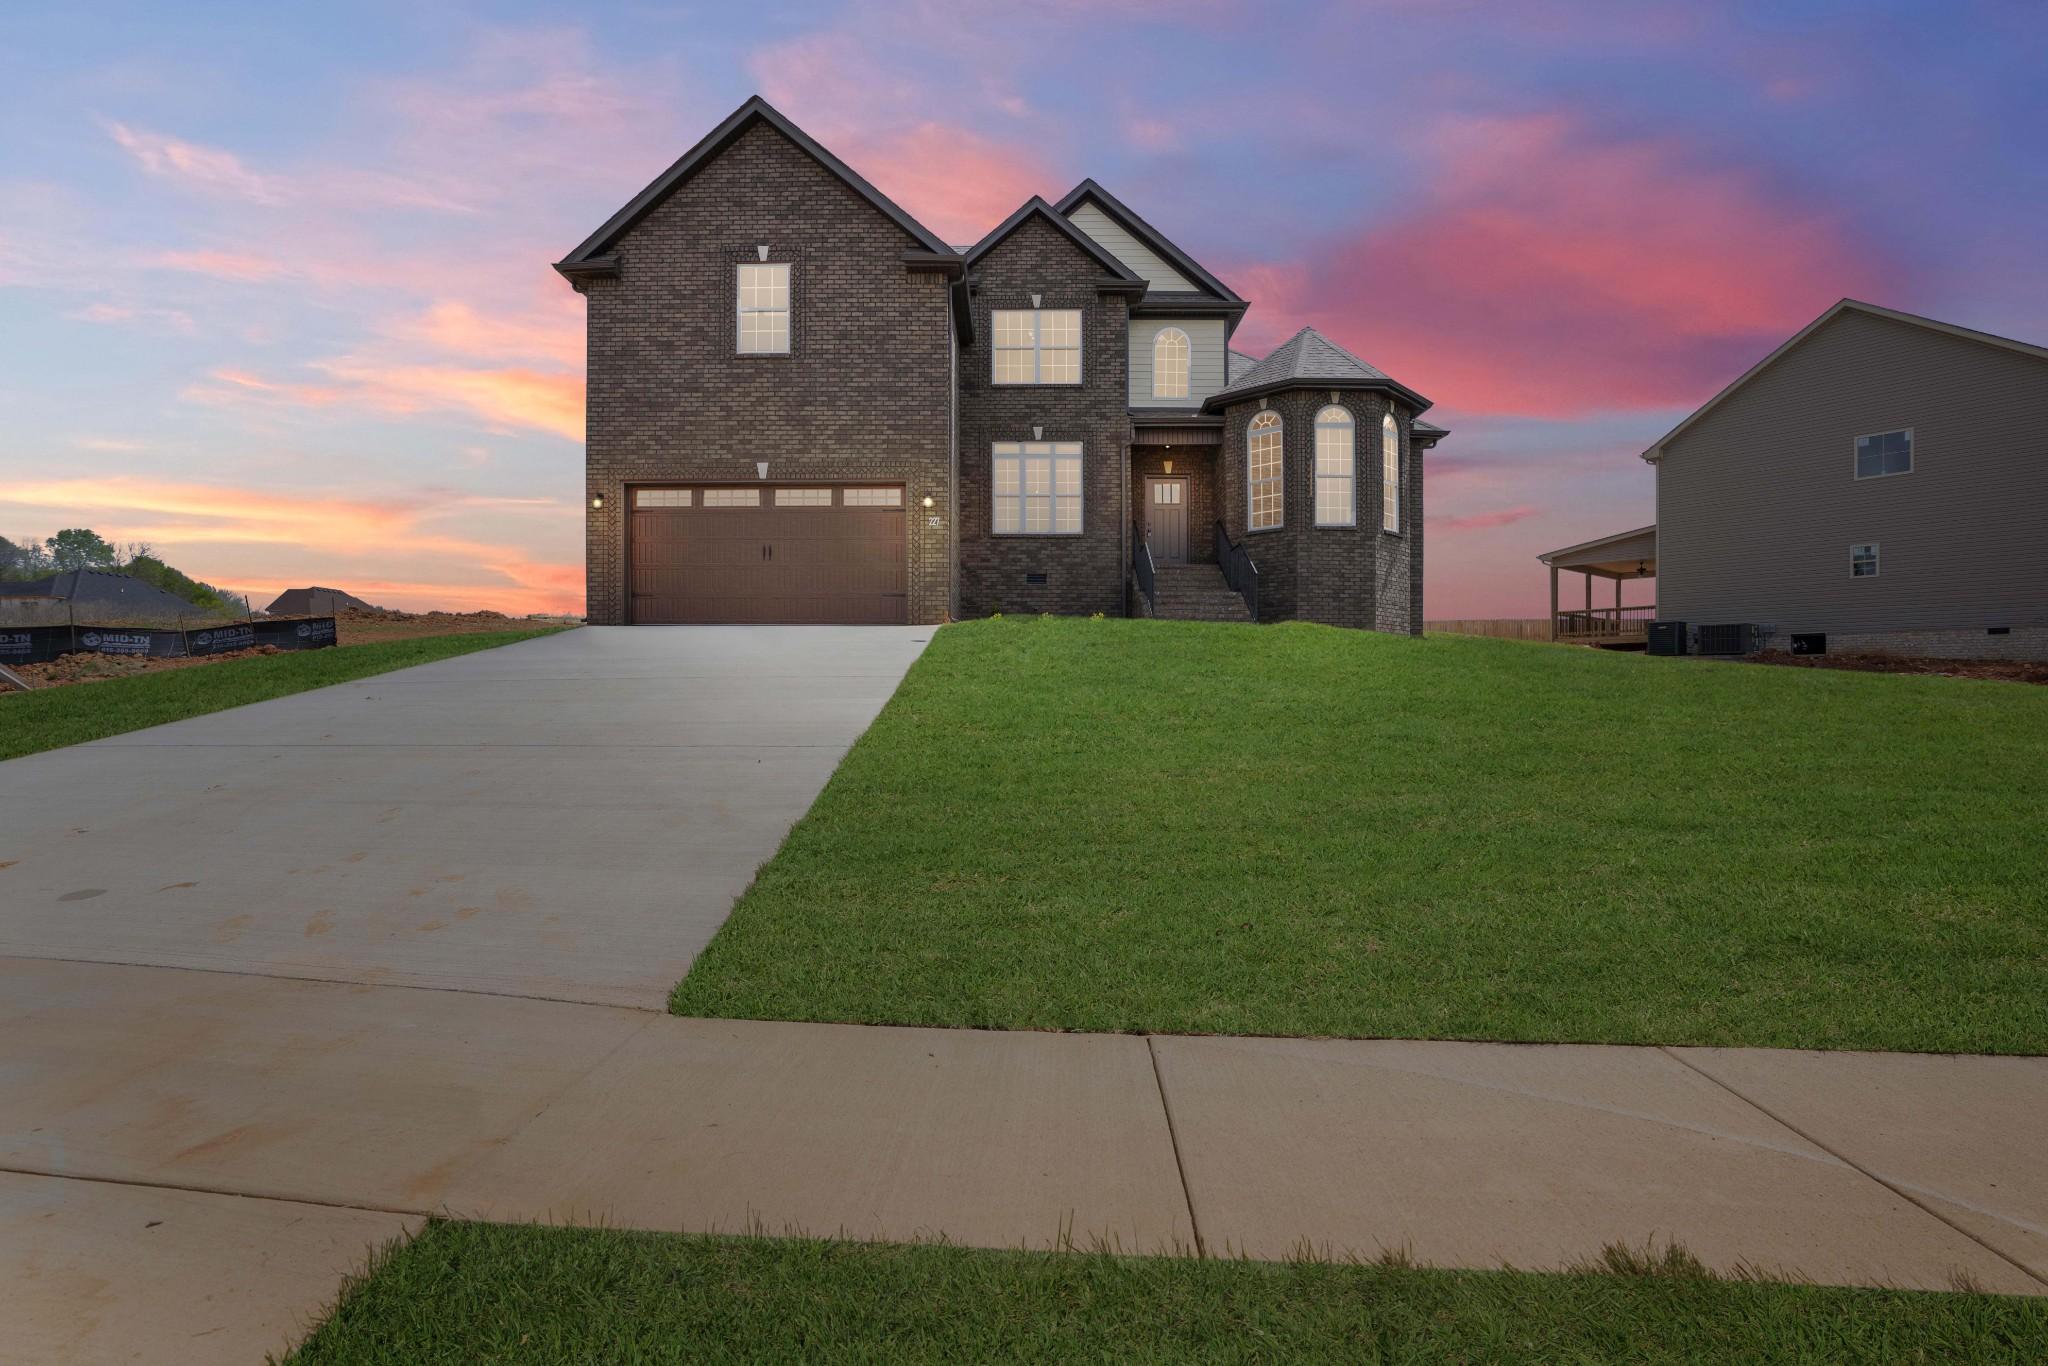 677 Farmington, Clarksville, TN 37043 - Clarksville, TN real estate listing